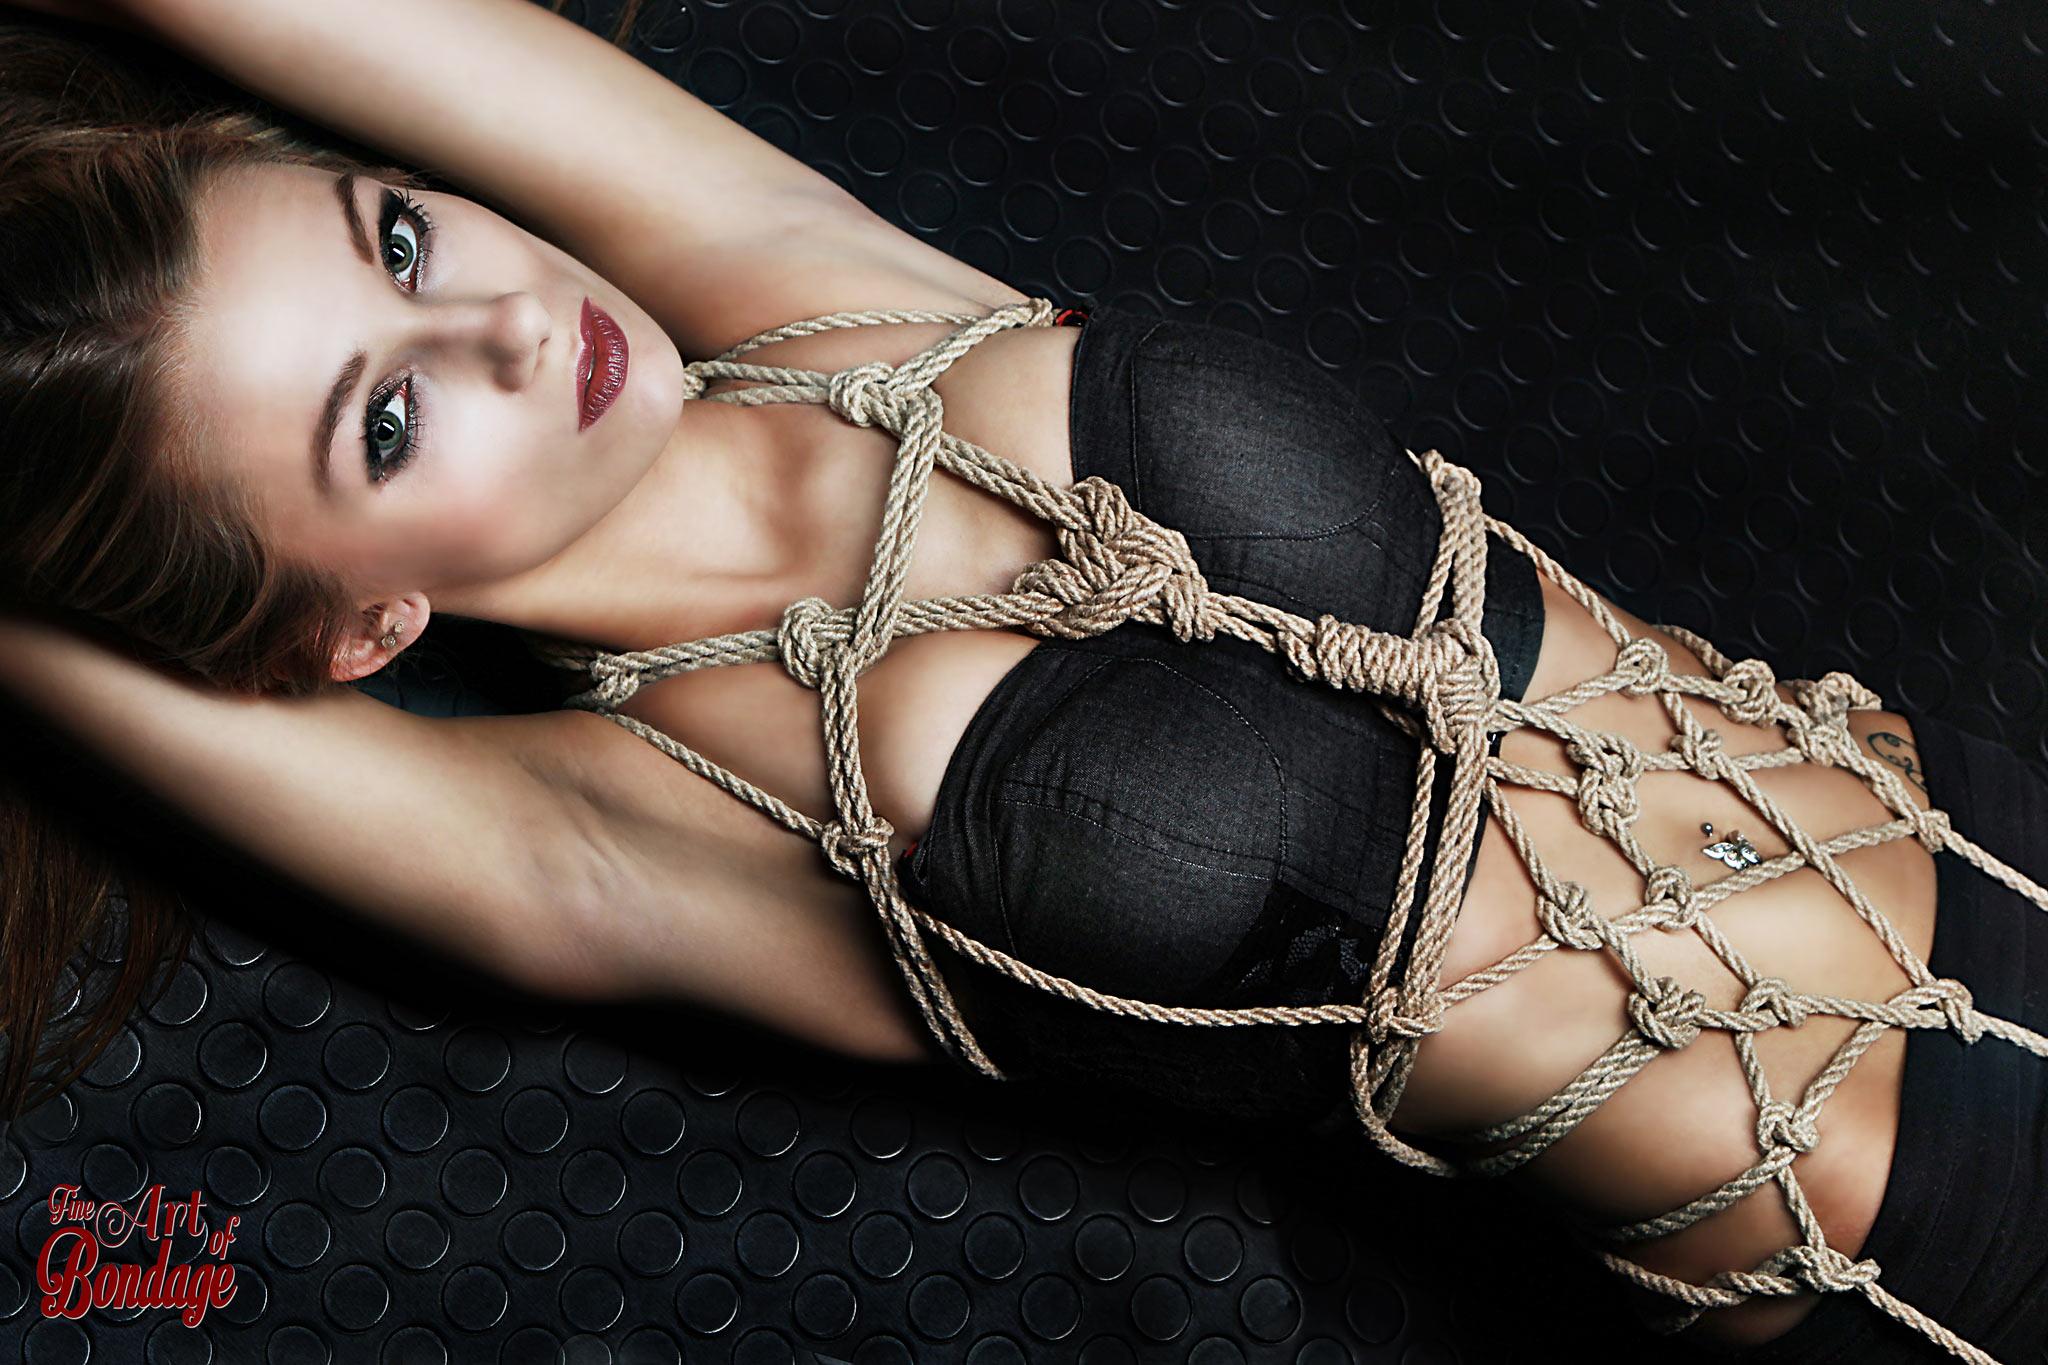 nude tied up art